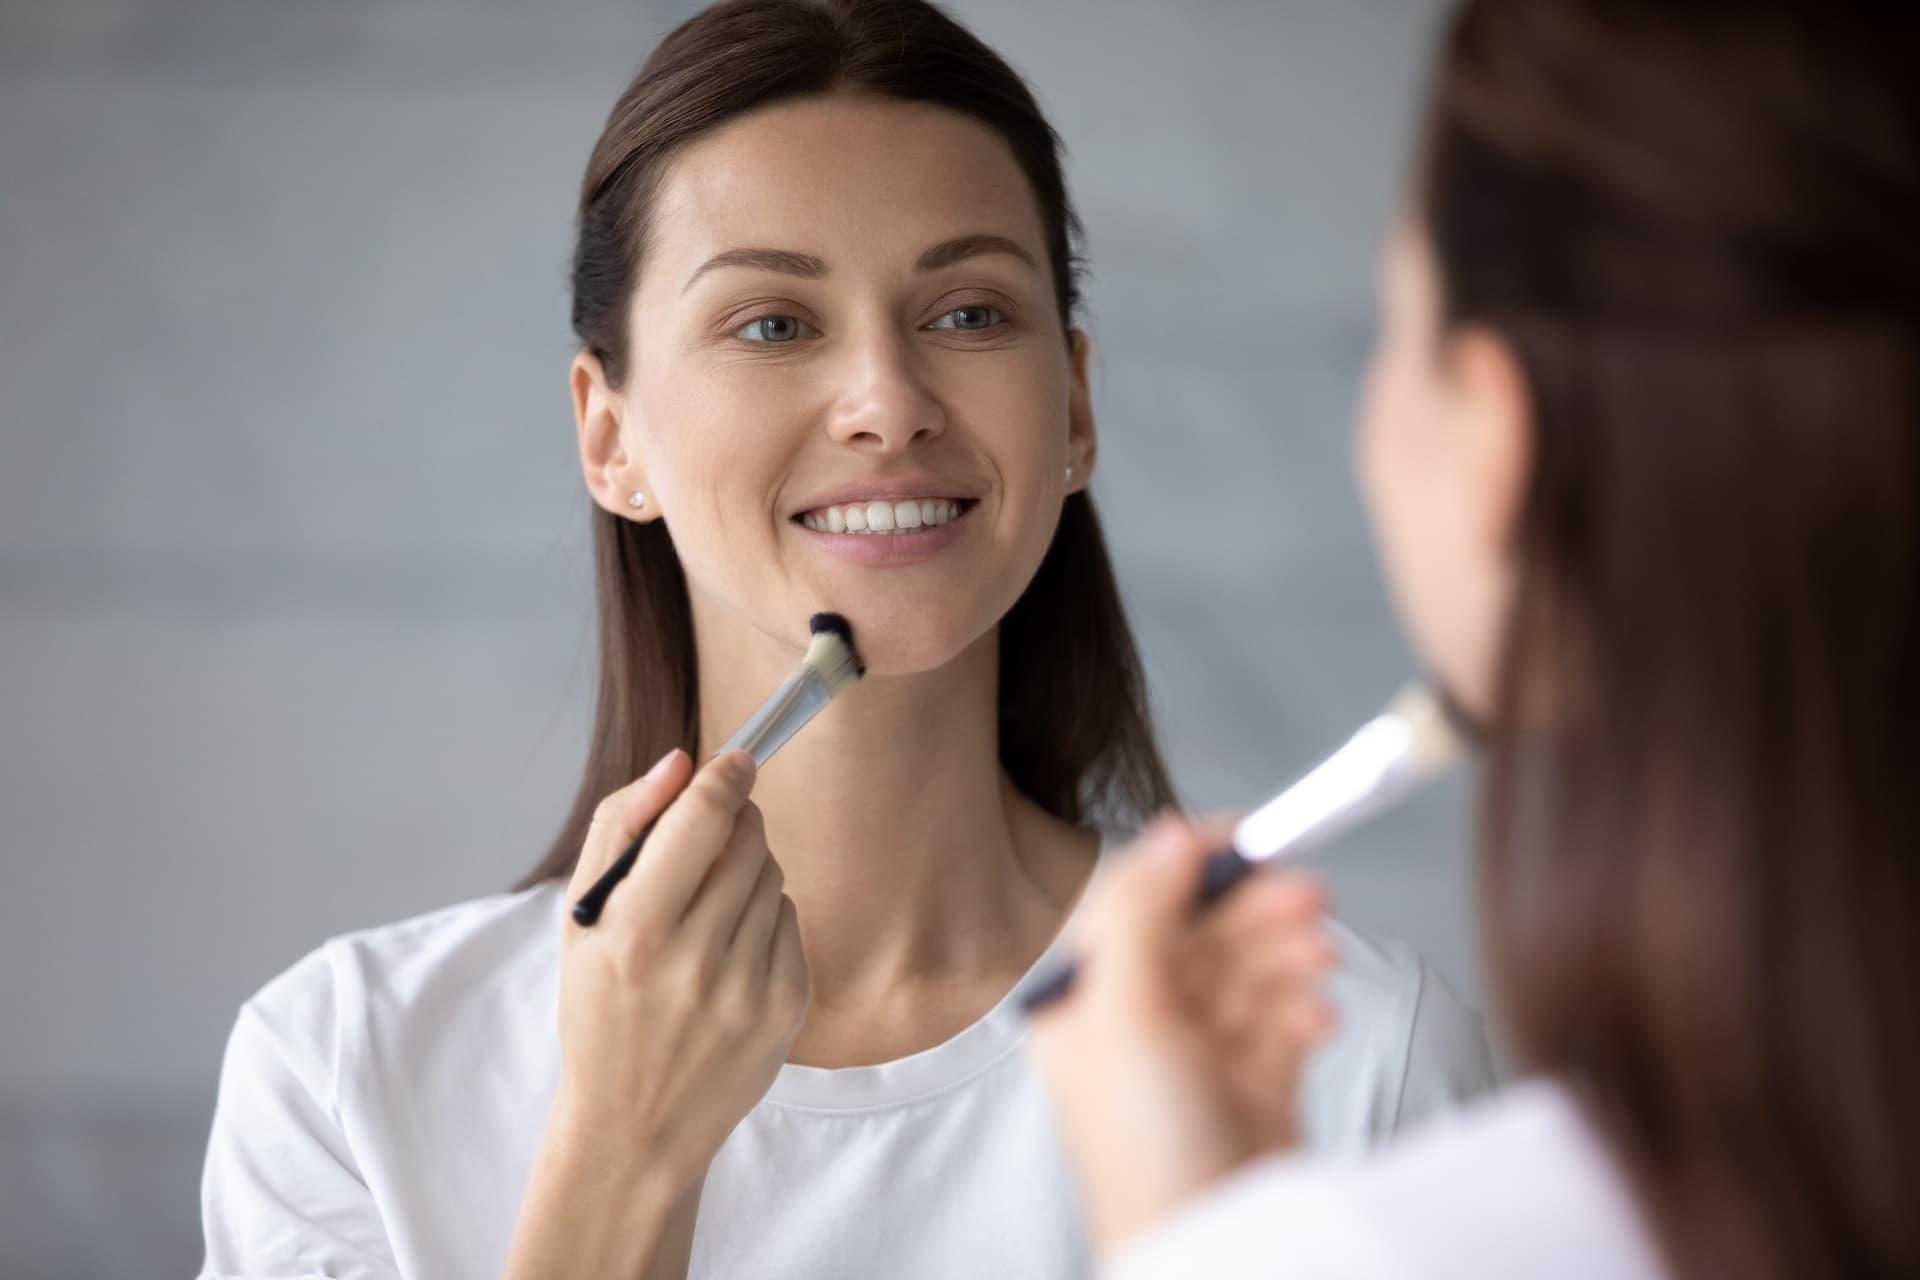 Frau trägt Make-up auf